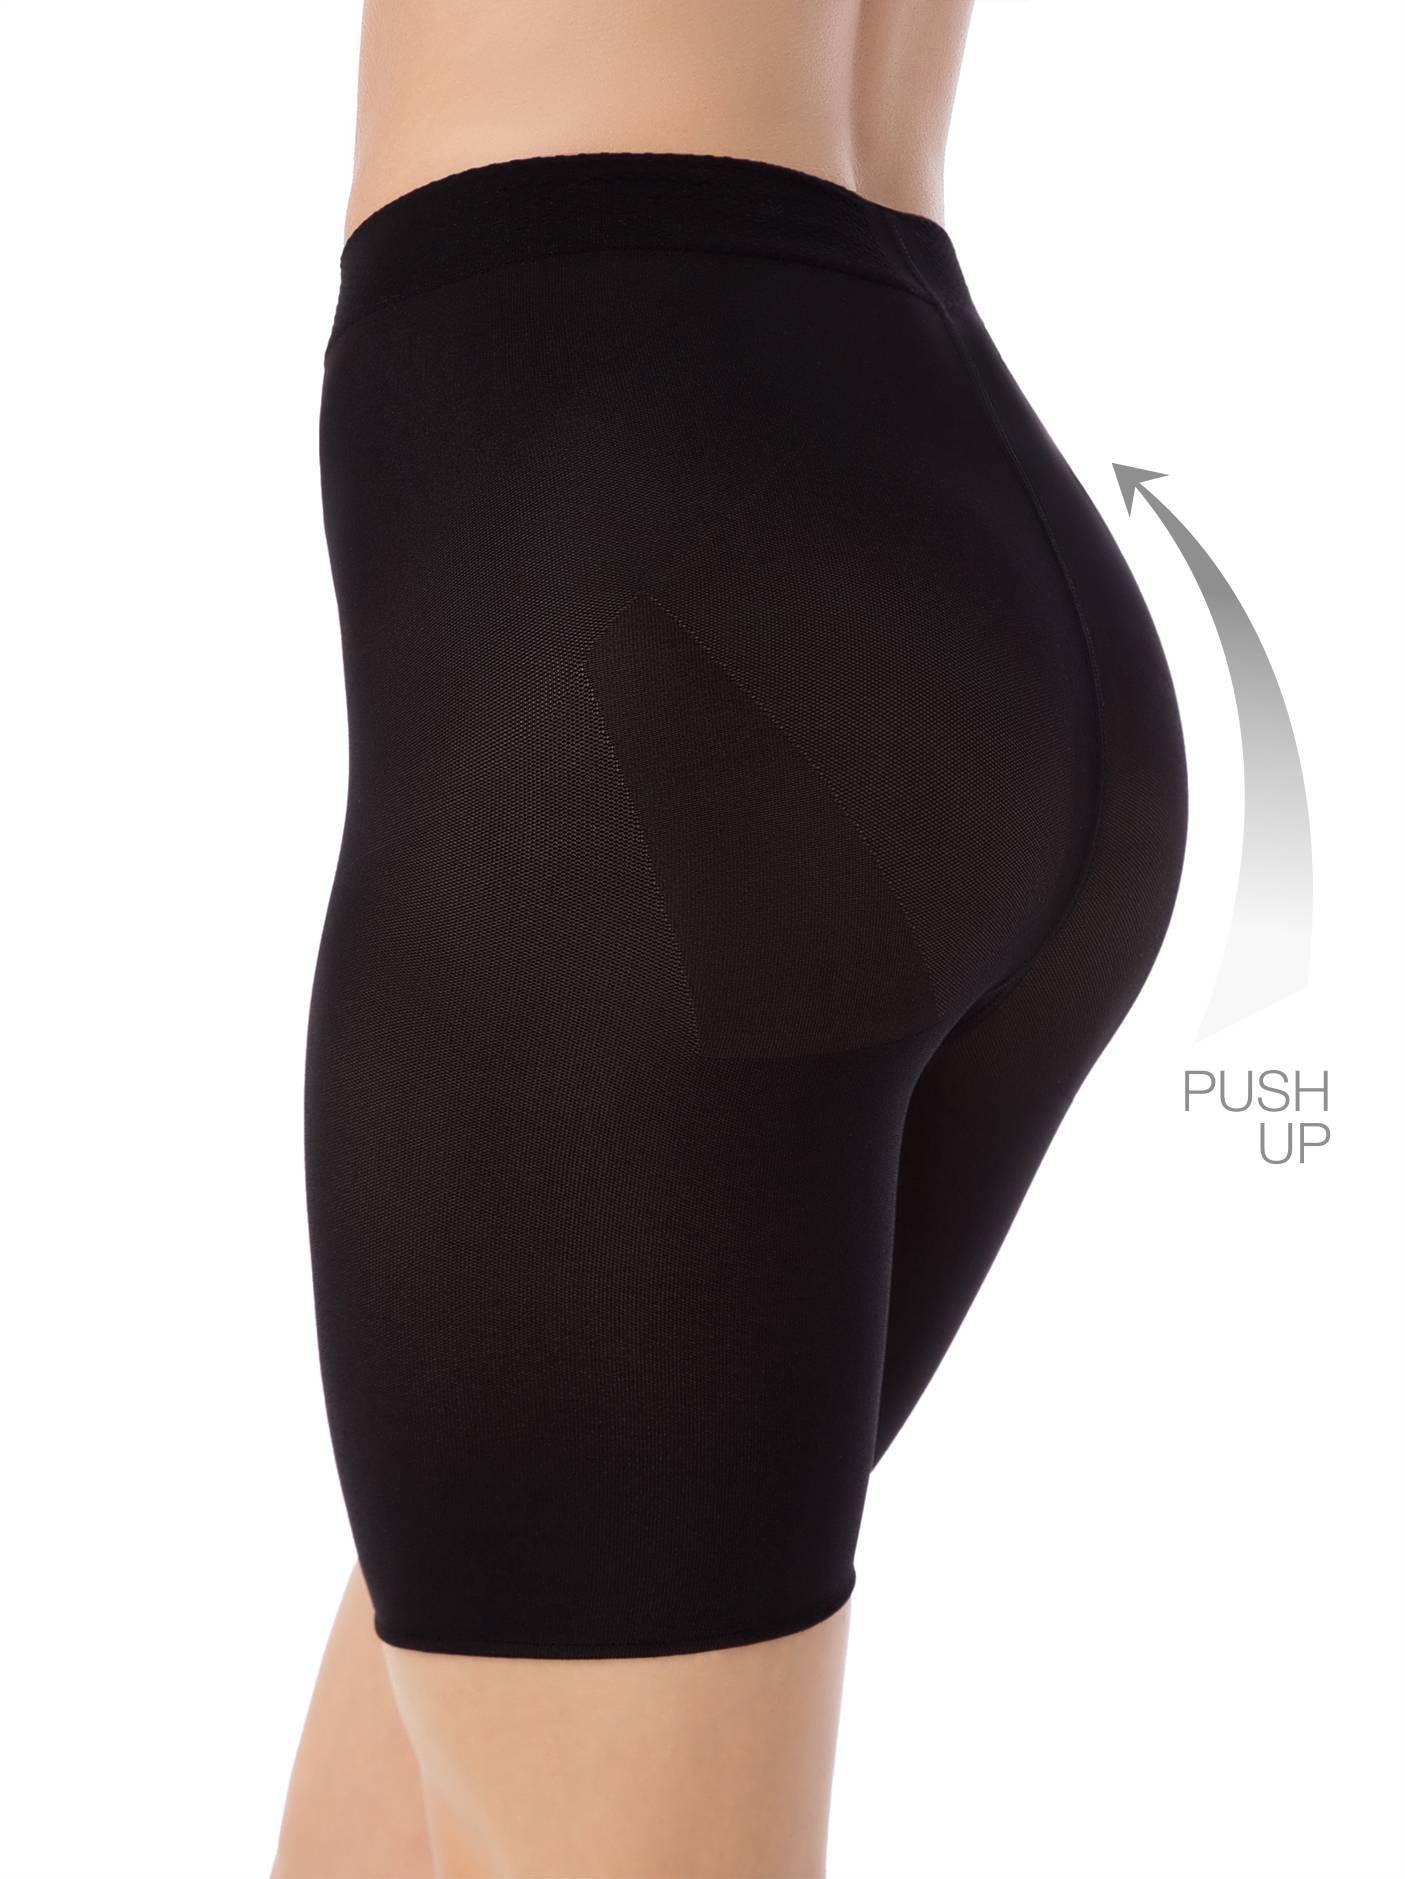 Леггинсы-шорты женские ⭐️ Шорты утягивающие X-PRESS ⭐️